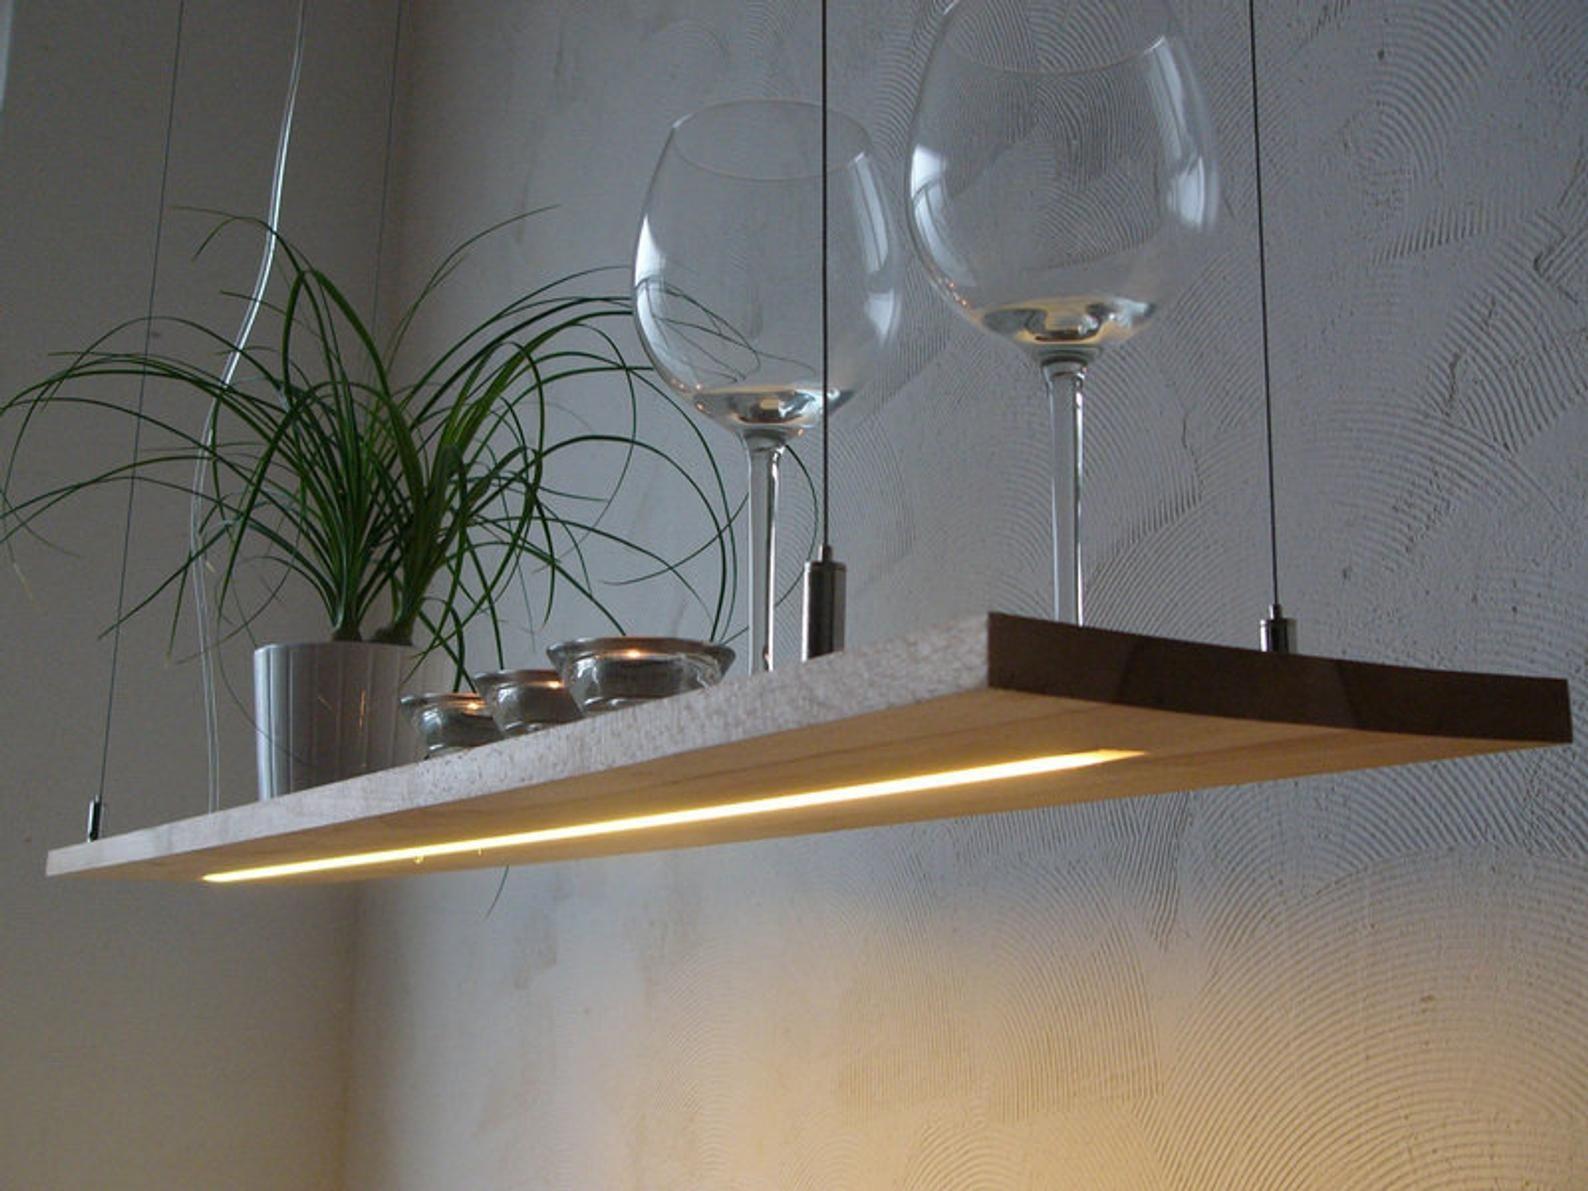 Hanging Lamp Beech Shelf Lamp Led Light Esszimmerlampe Opknoping Beuken Plank Led Lamp Aanbodzijde Etsy Lampe Hangende Gluhbirnen Led Leuchten